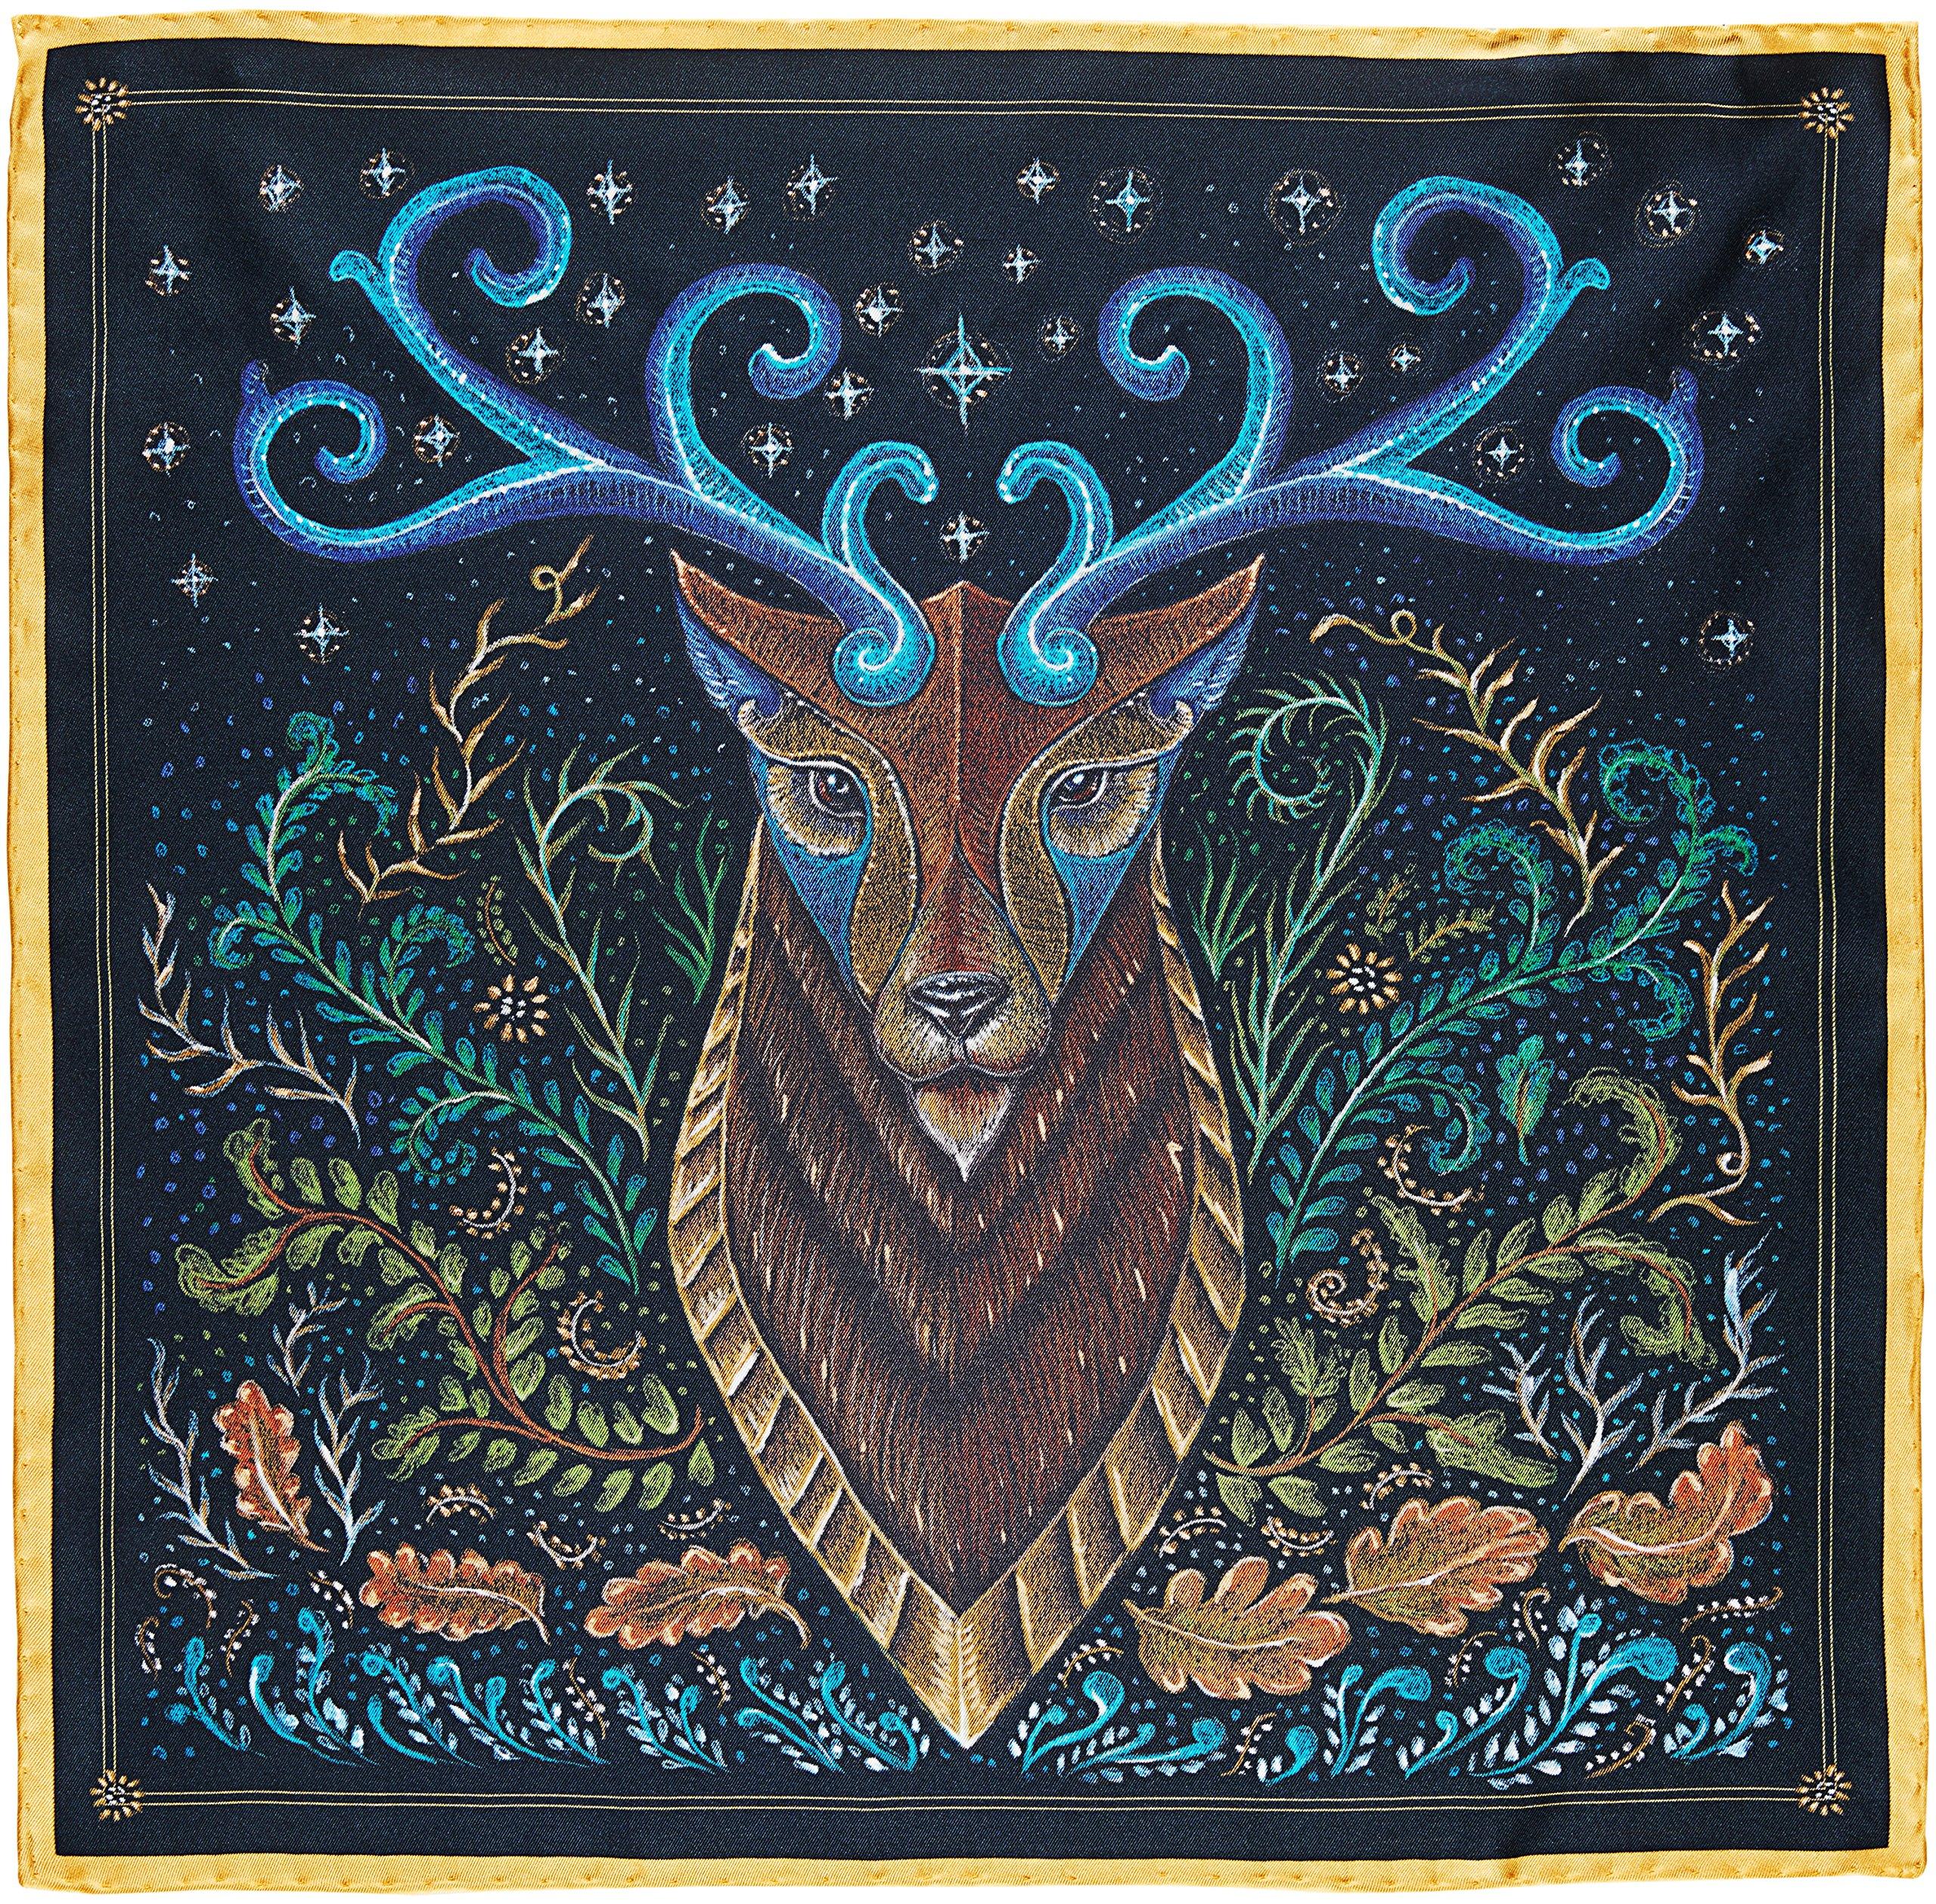 R. Culturi Made in Italy 100% Silk Pocket Square Original Artwork (Black/Gold) Gift Box